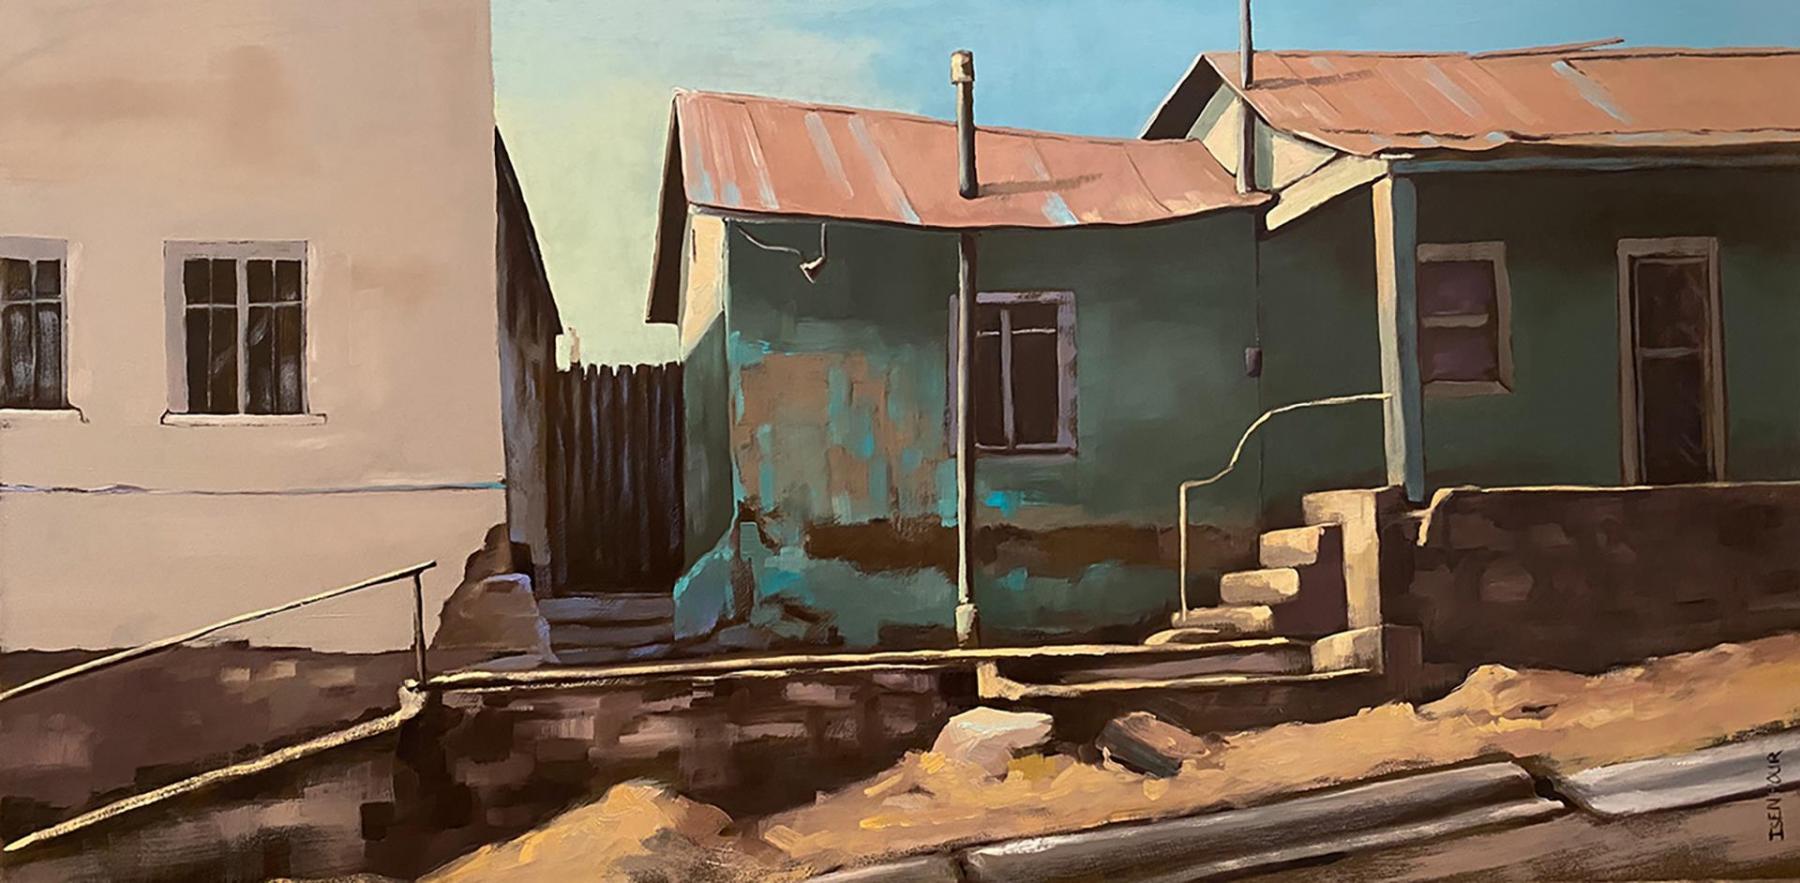 Isenhour-Natasha-Sticks-and-Stones-Oil-12-x-24